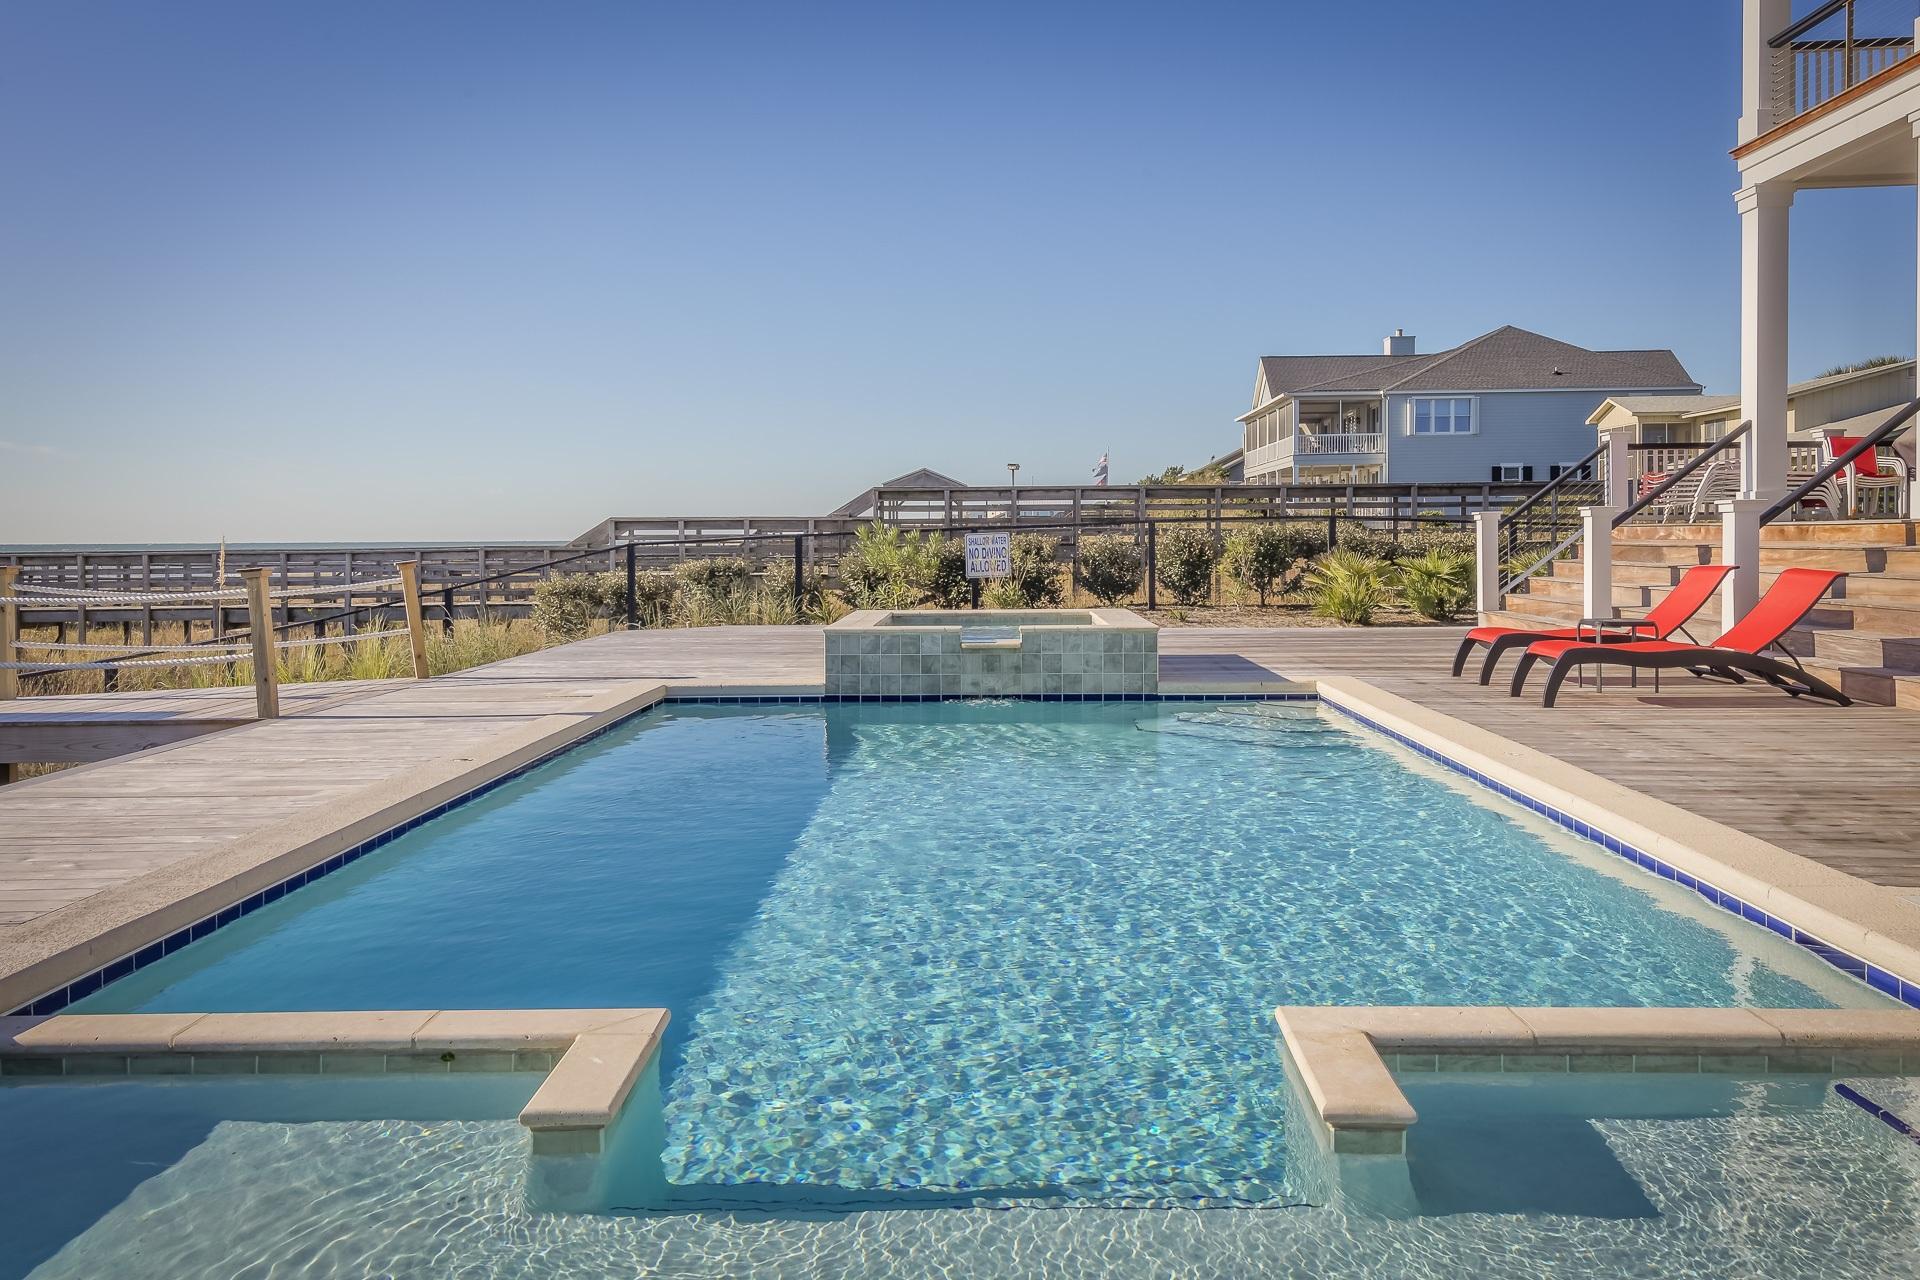 maison-avec-piscine-bordeaux-infinity-pool